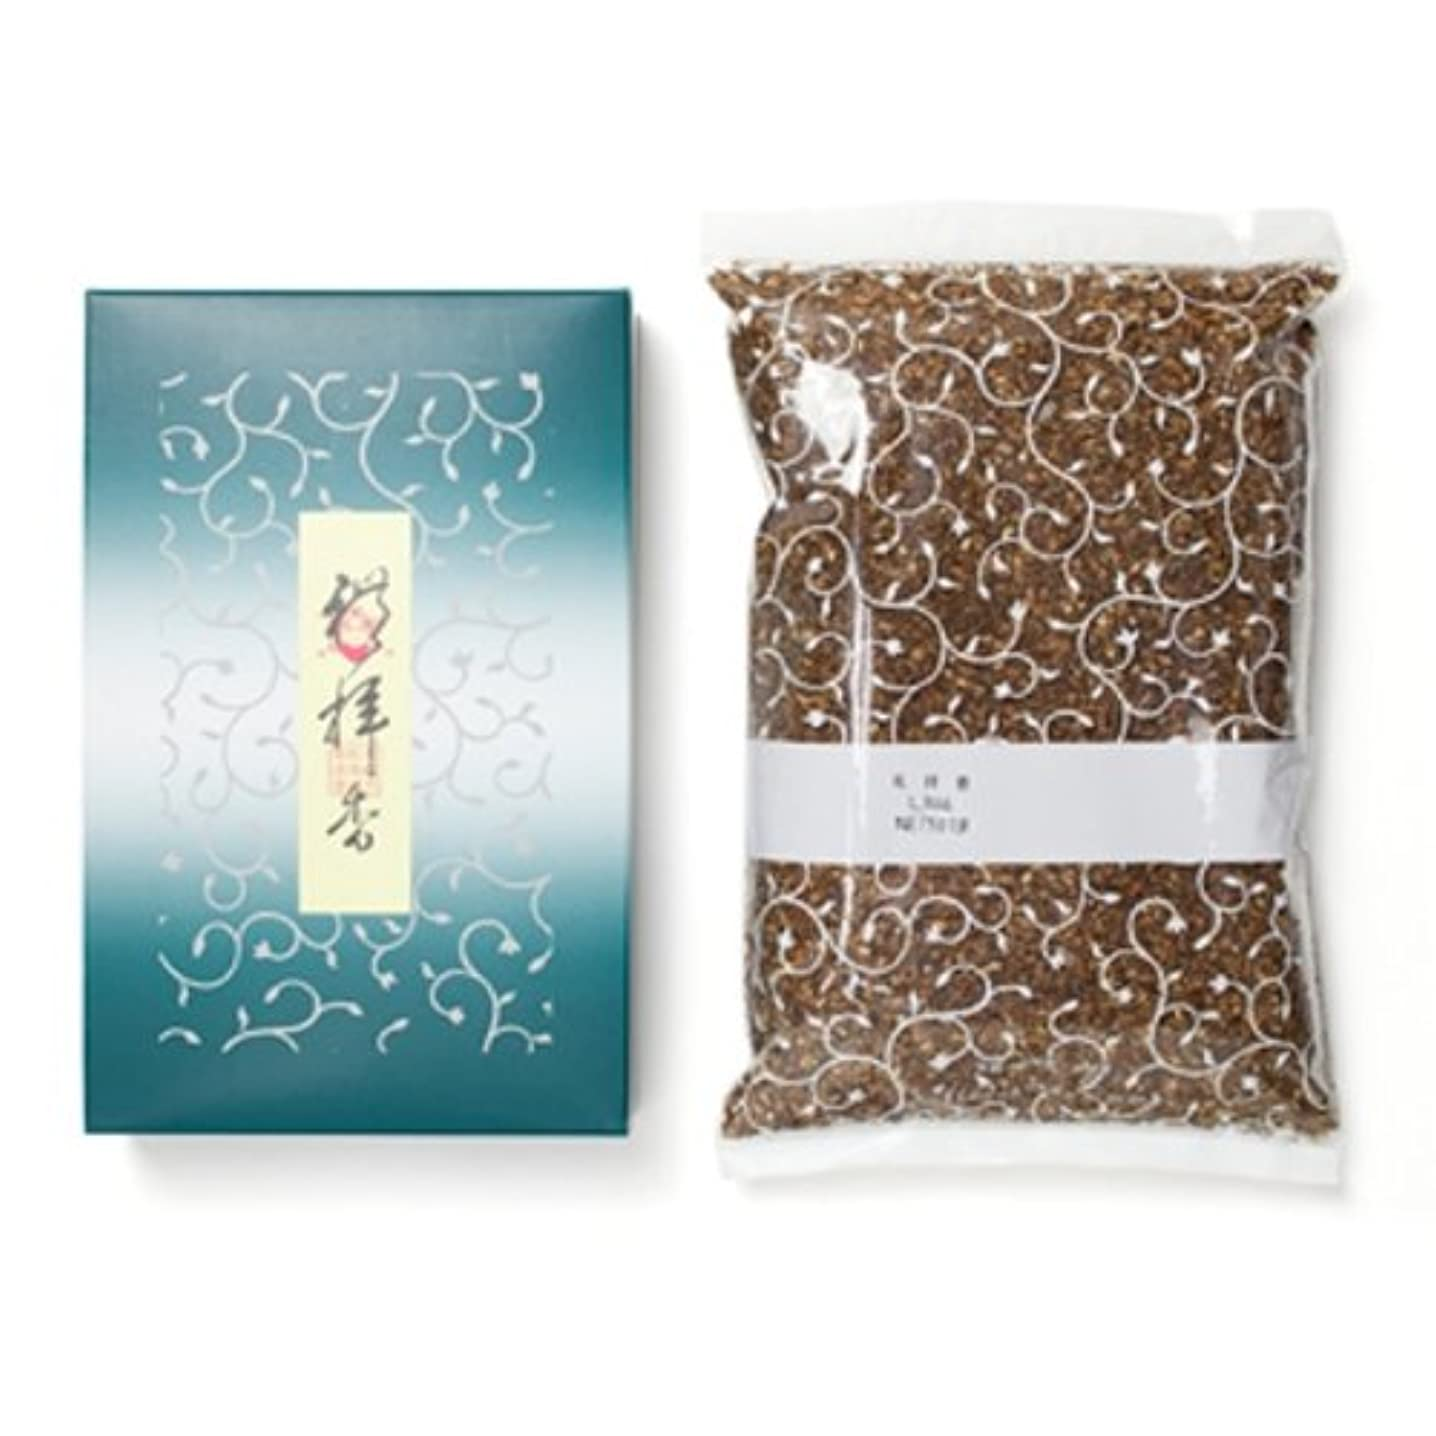 松栄堂のお焼香 礼拝香 500g詰 紙箱入 #410511